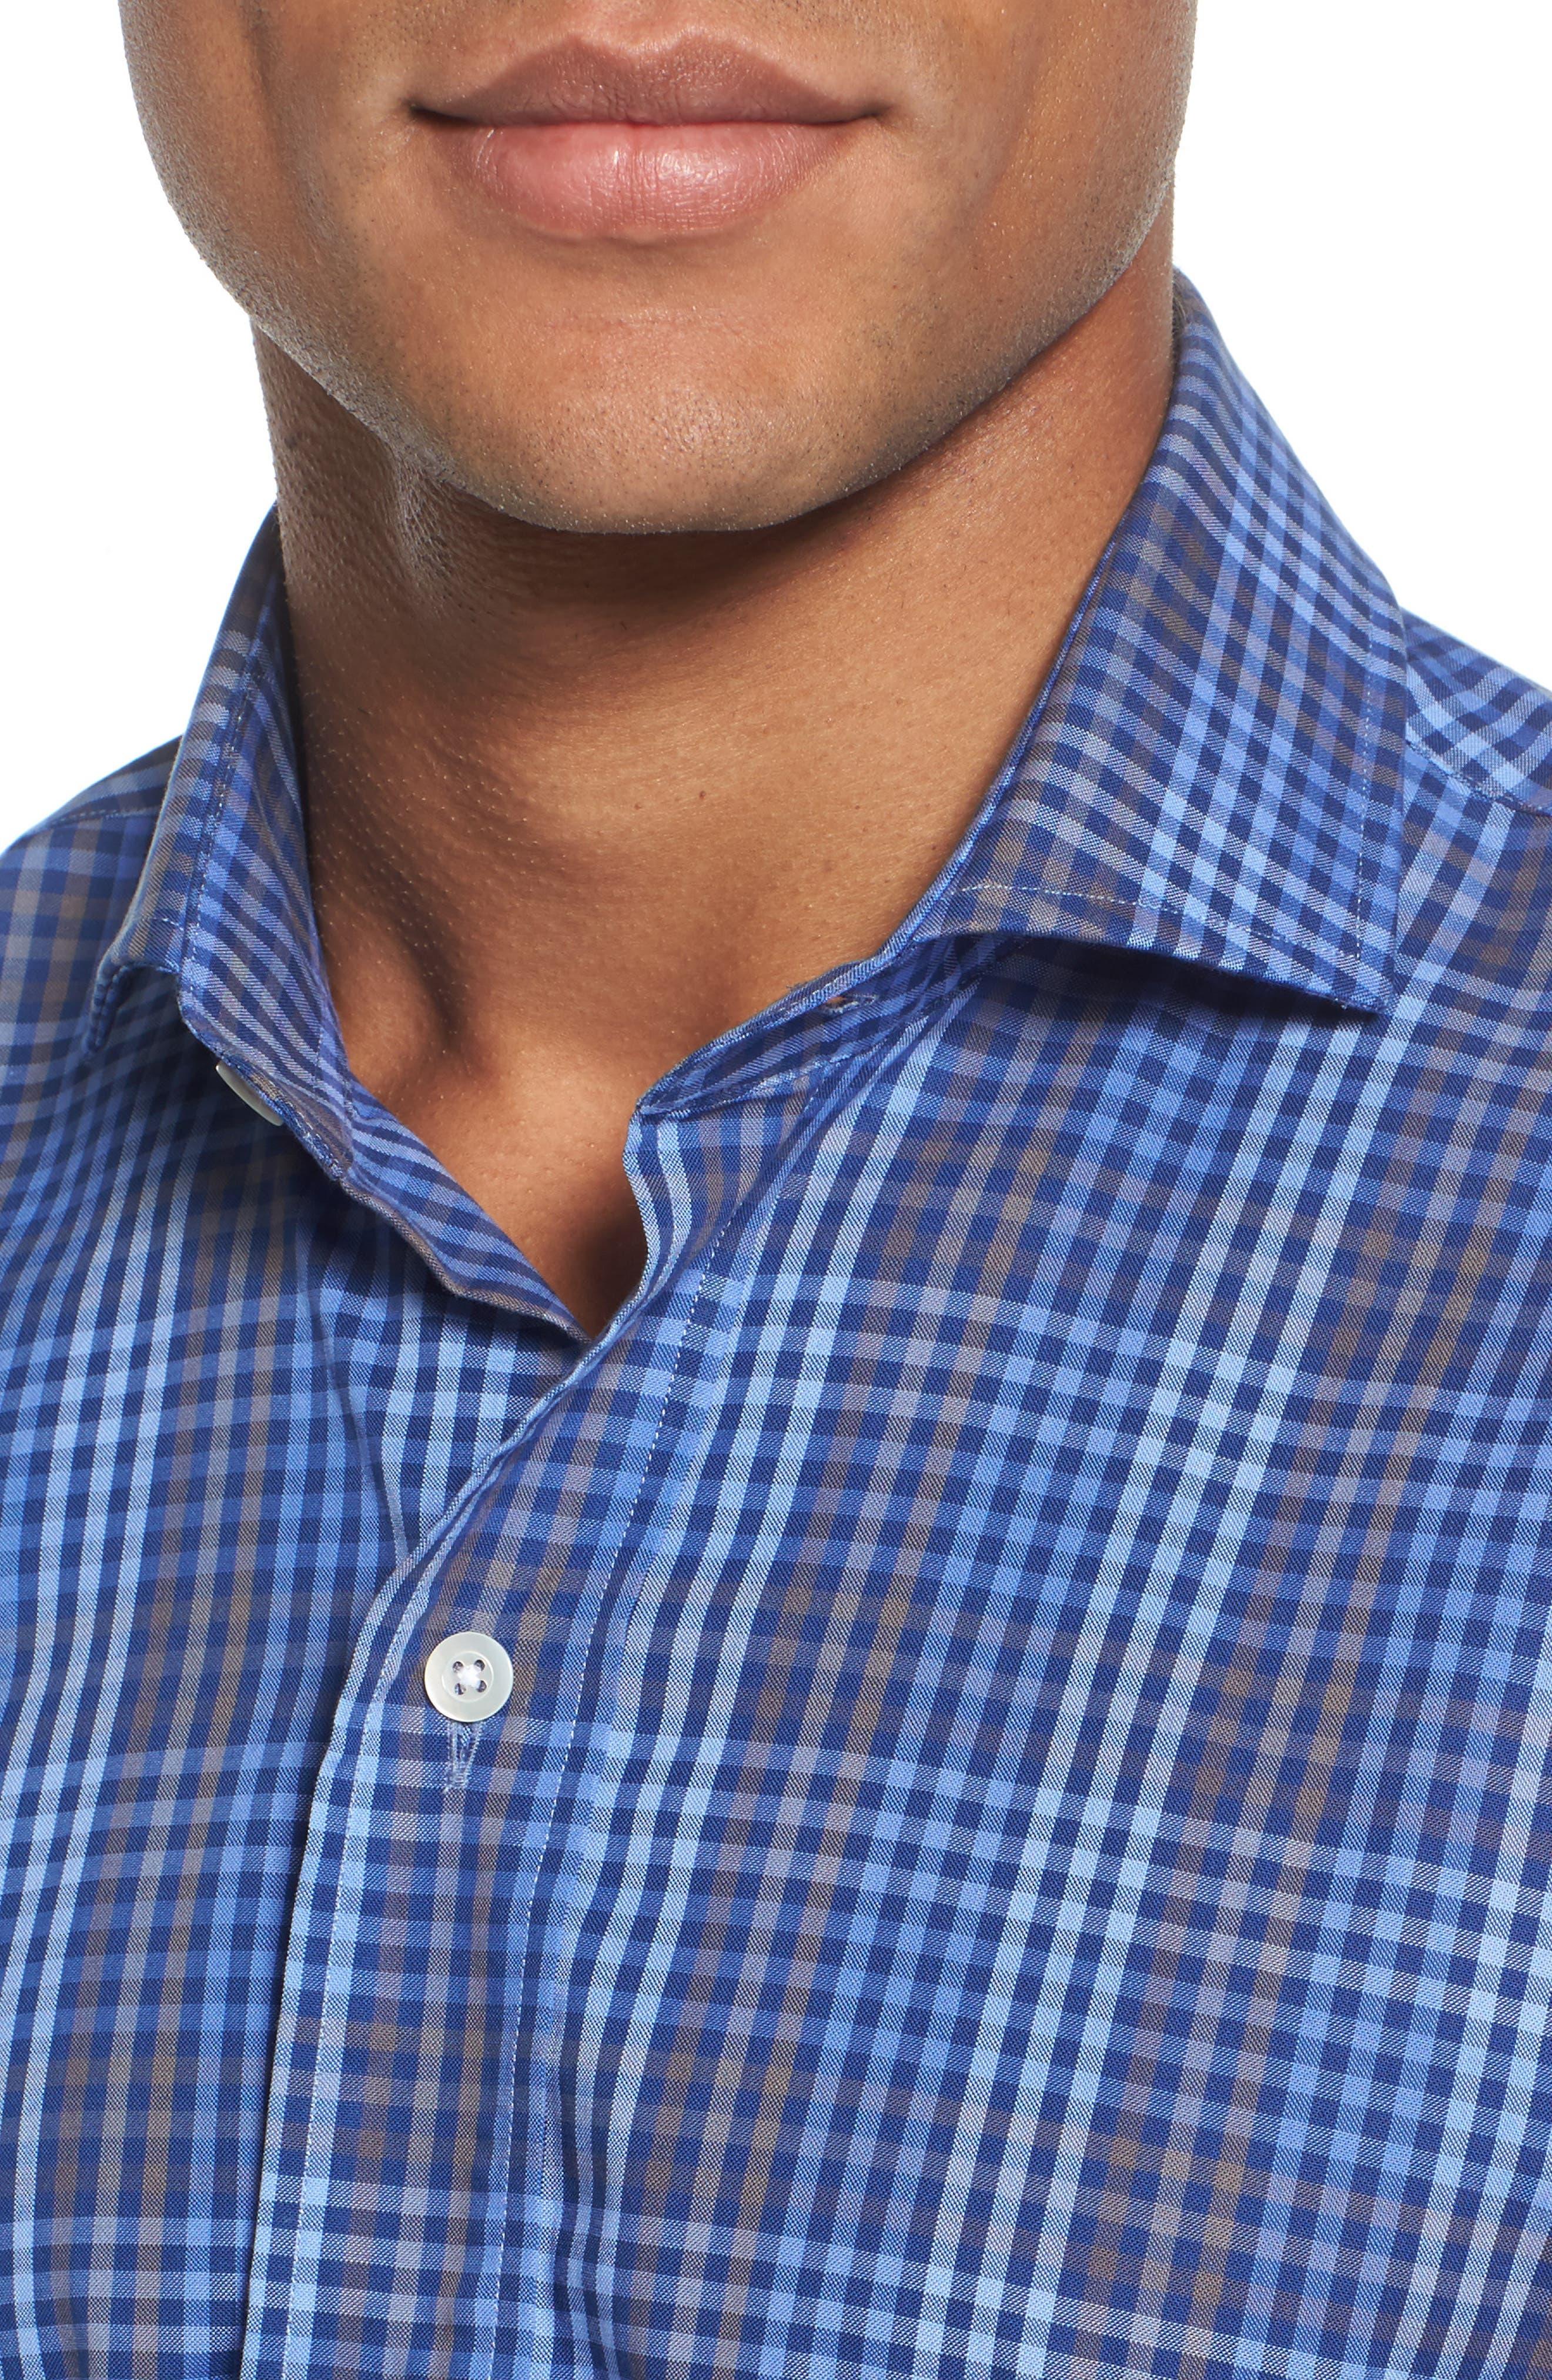 Alden Slim Fit Check Sport Shirt,                             Alternate thumbnail 4, color,                             400